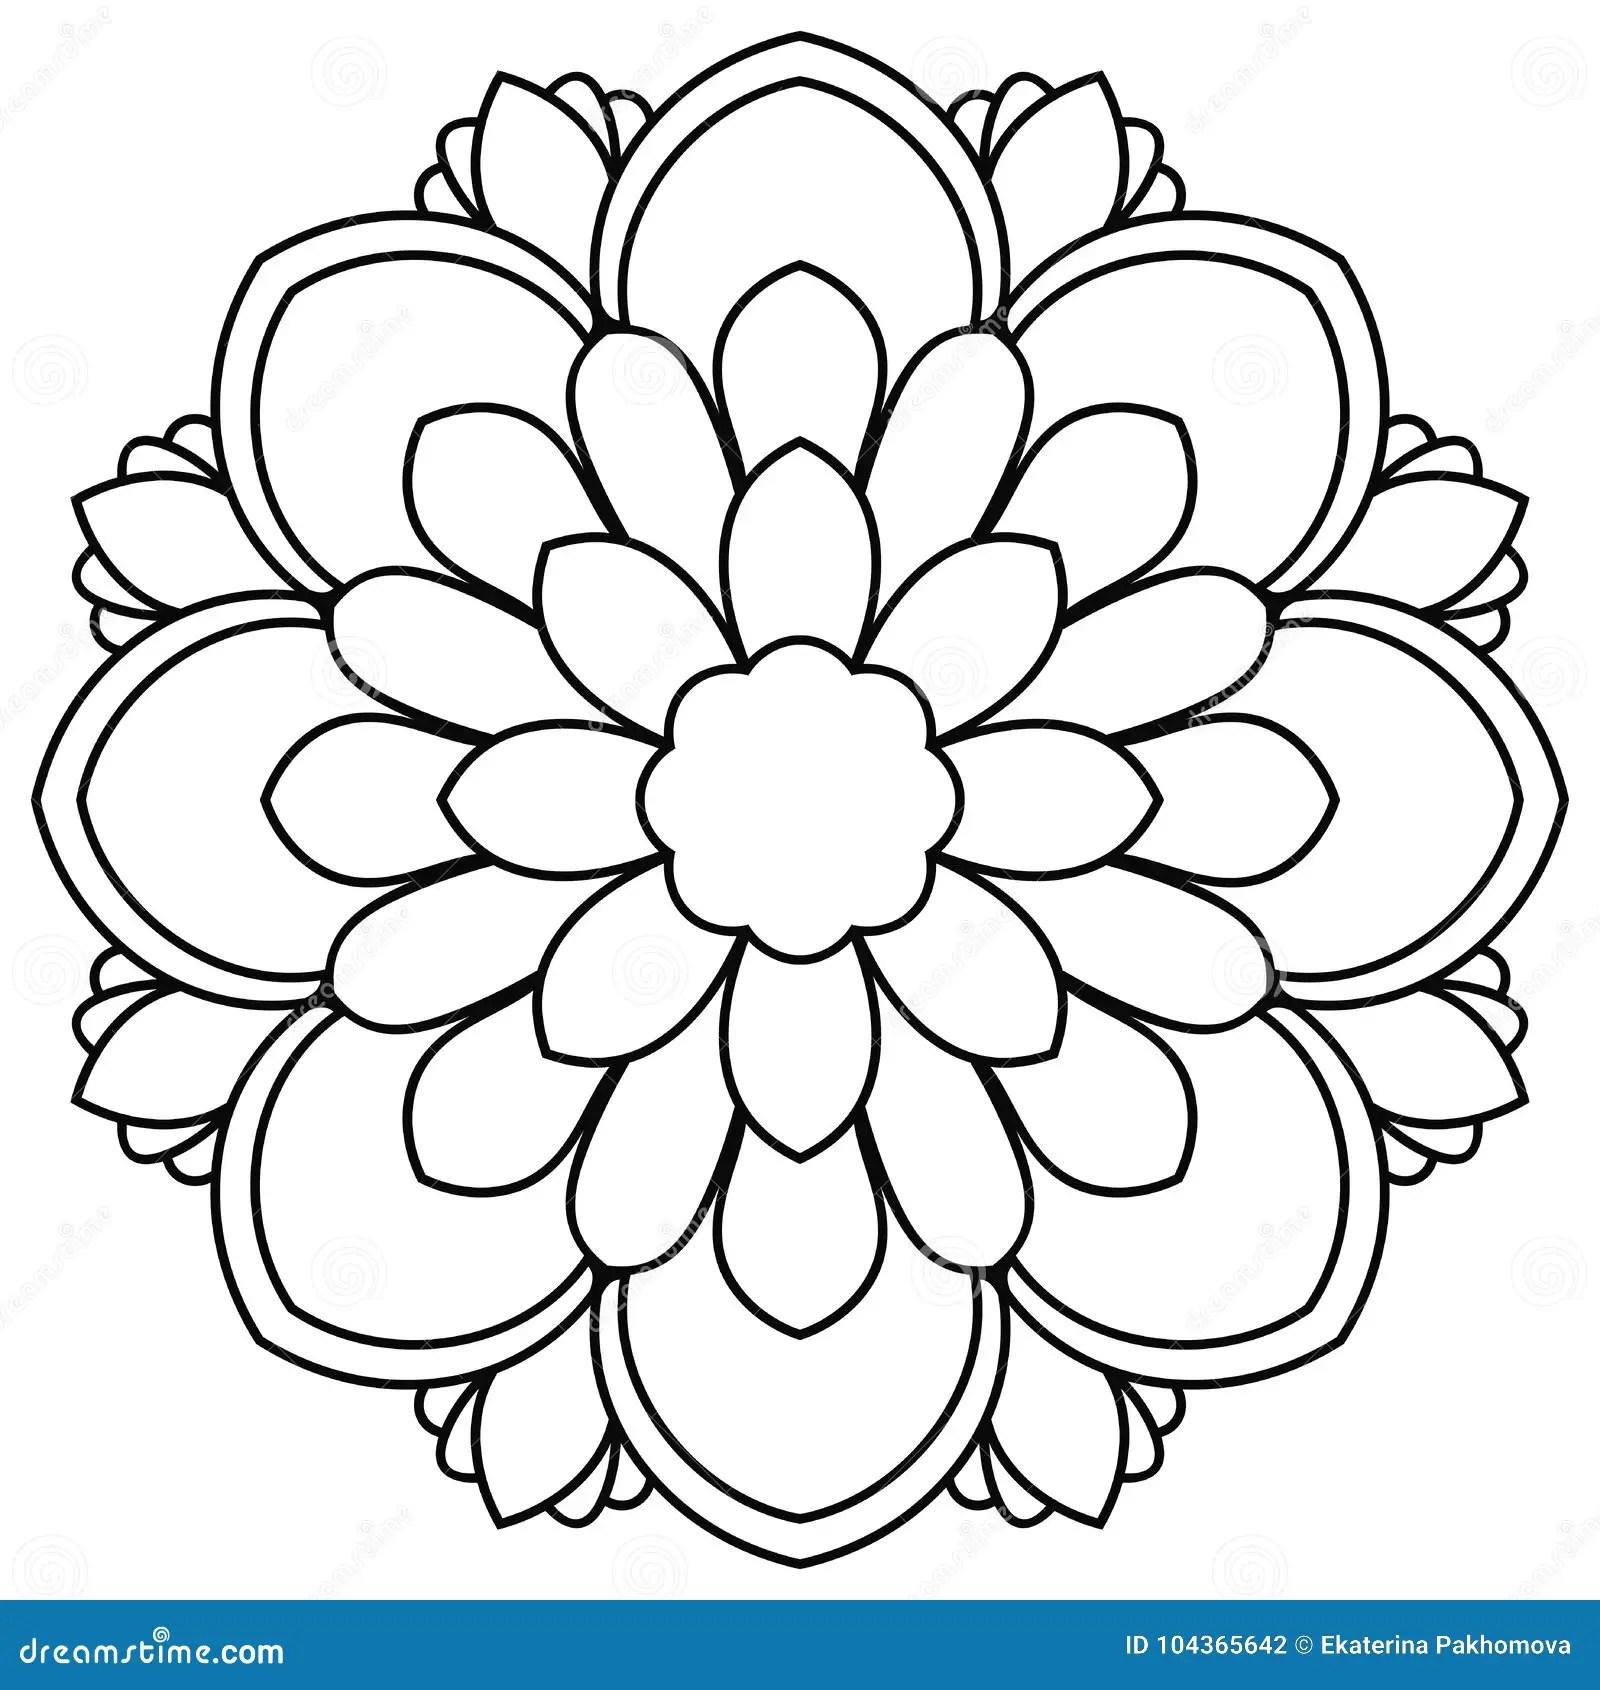 Black Outline Flower Mandala. Doodle Round Decorative